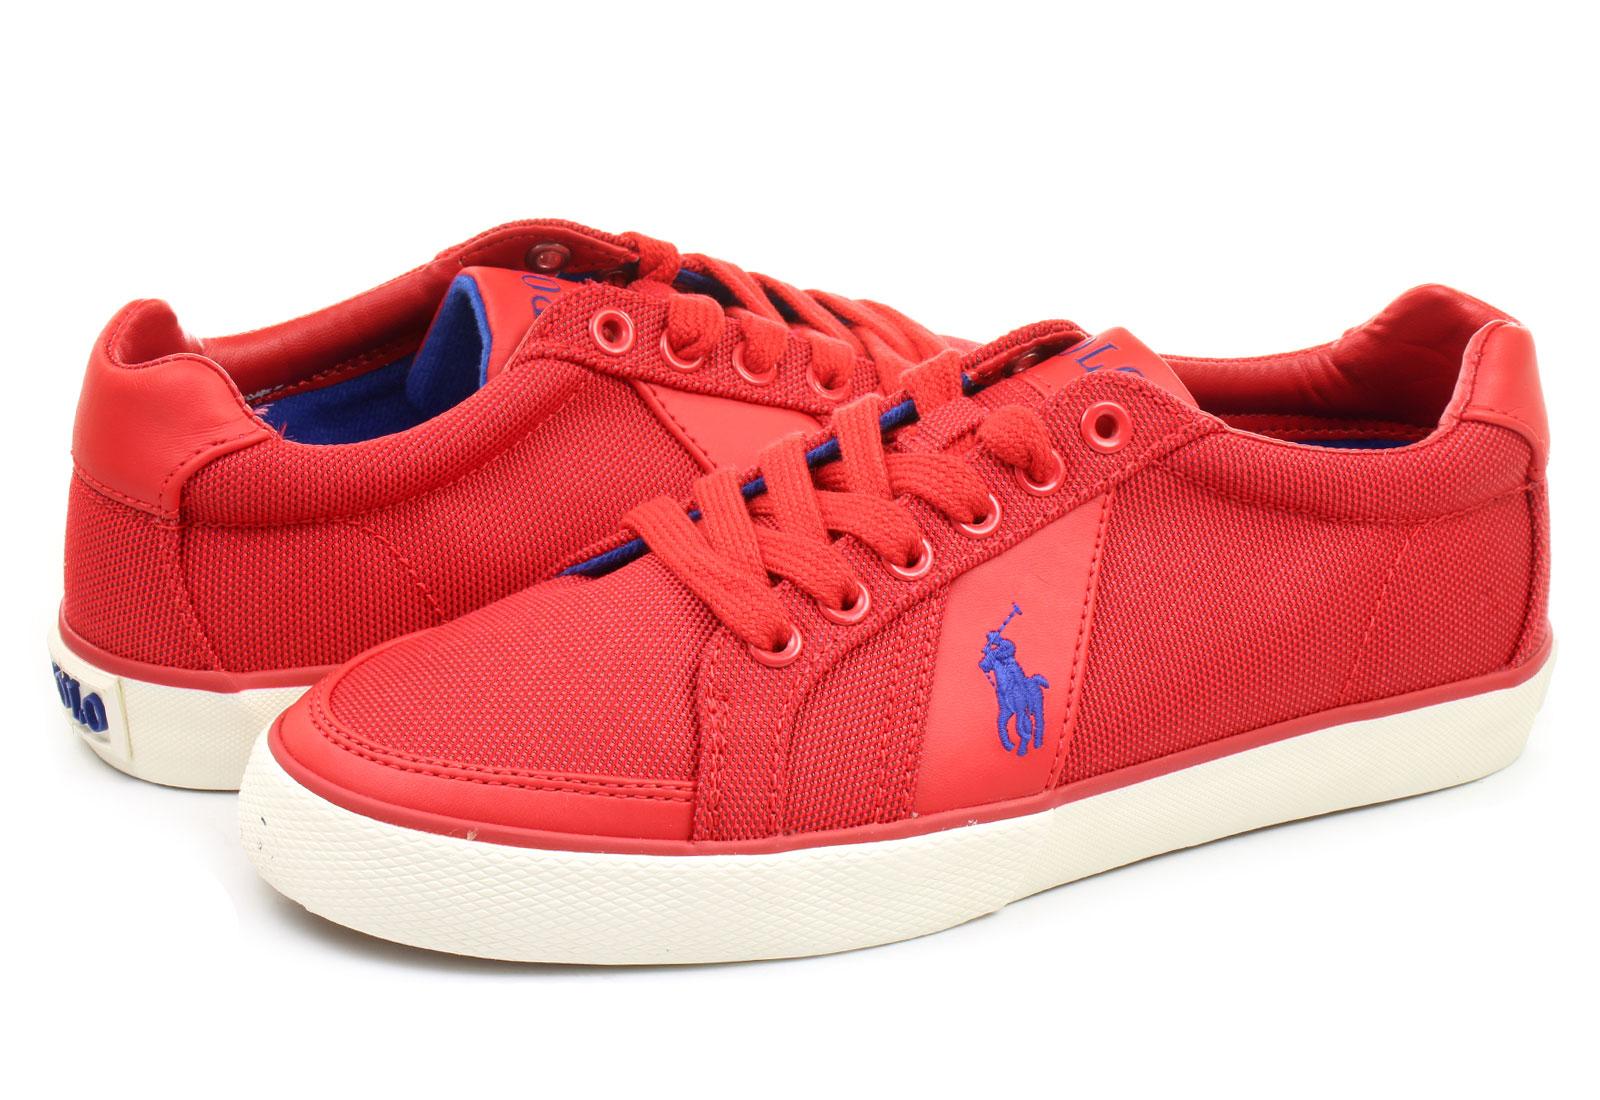 Mens Pink Polo Ralph Lauren Shoes